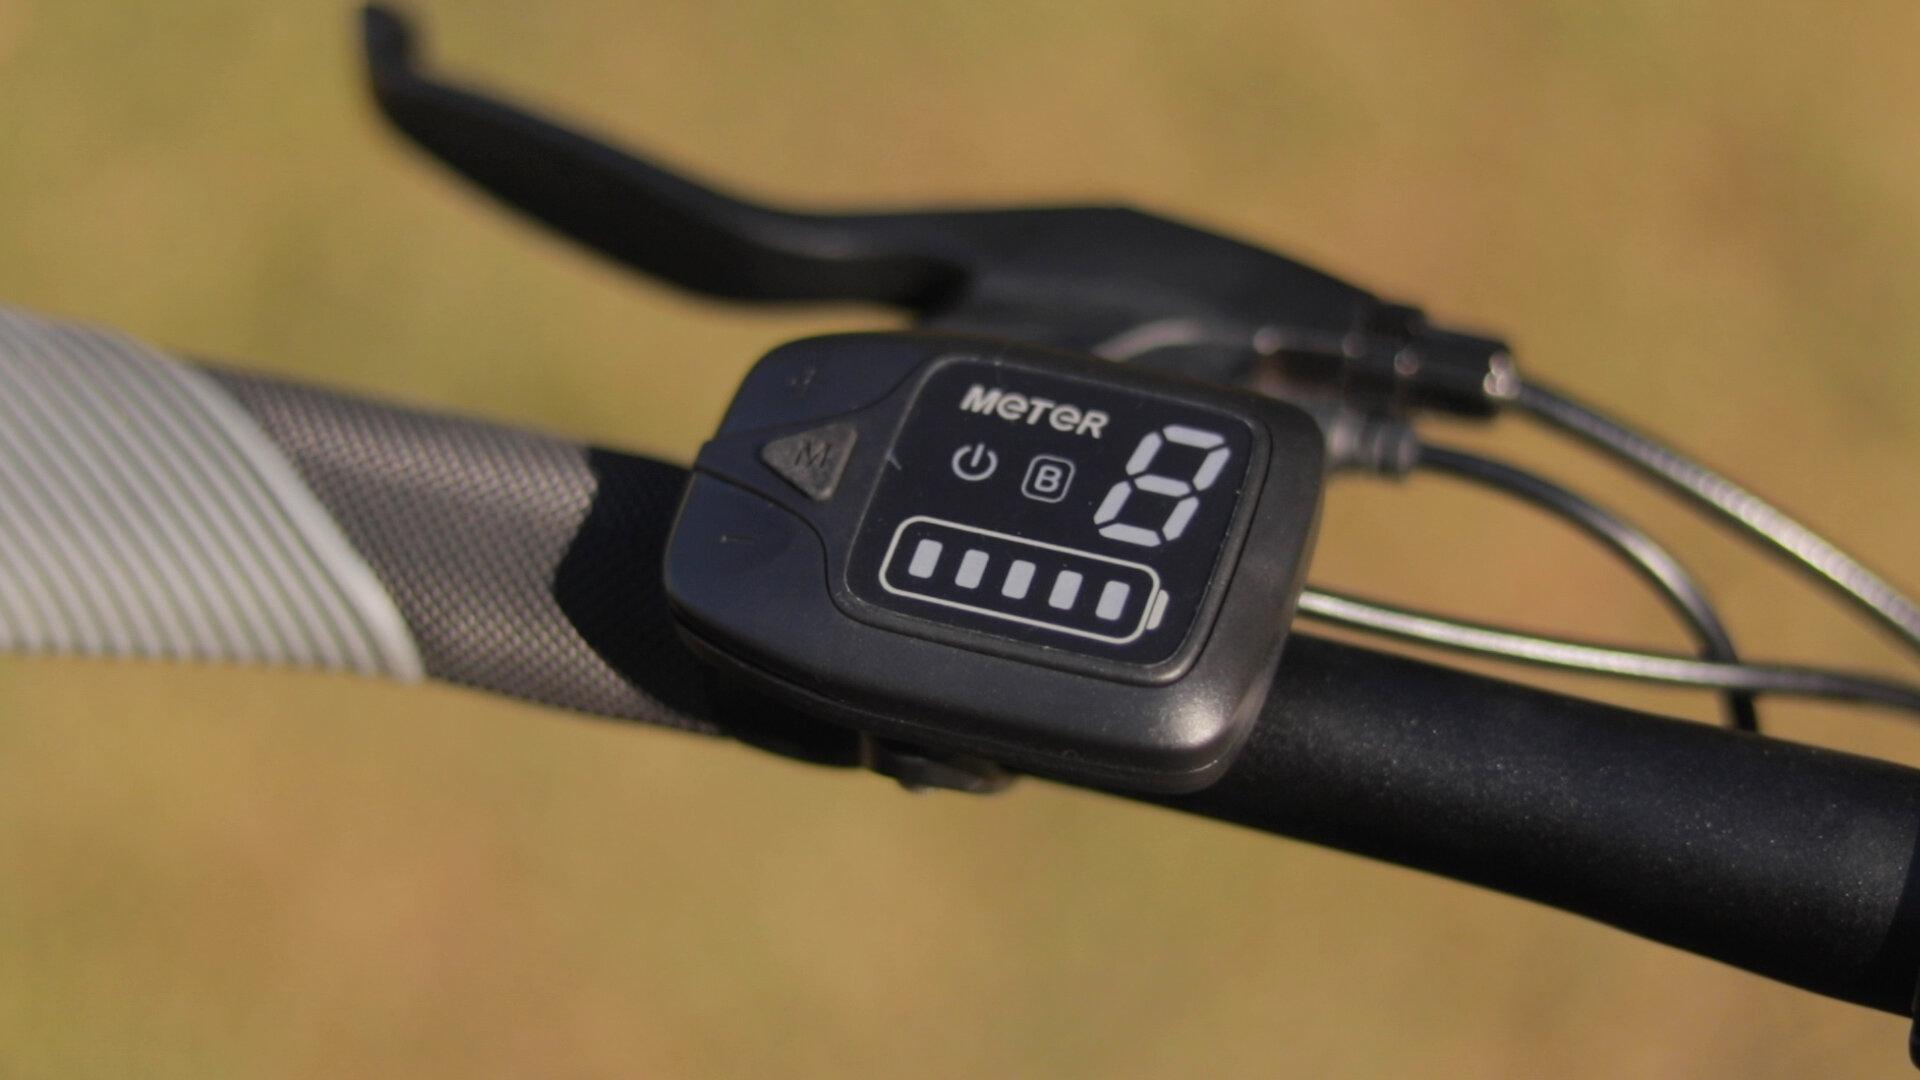 gotrax-shift-s1-electric-bike-review-2019-display.jpg